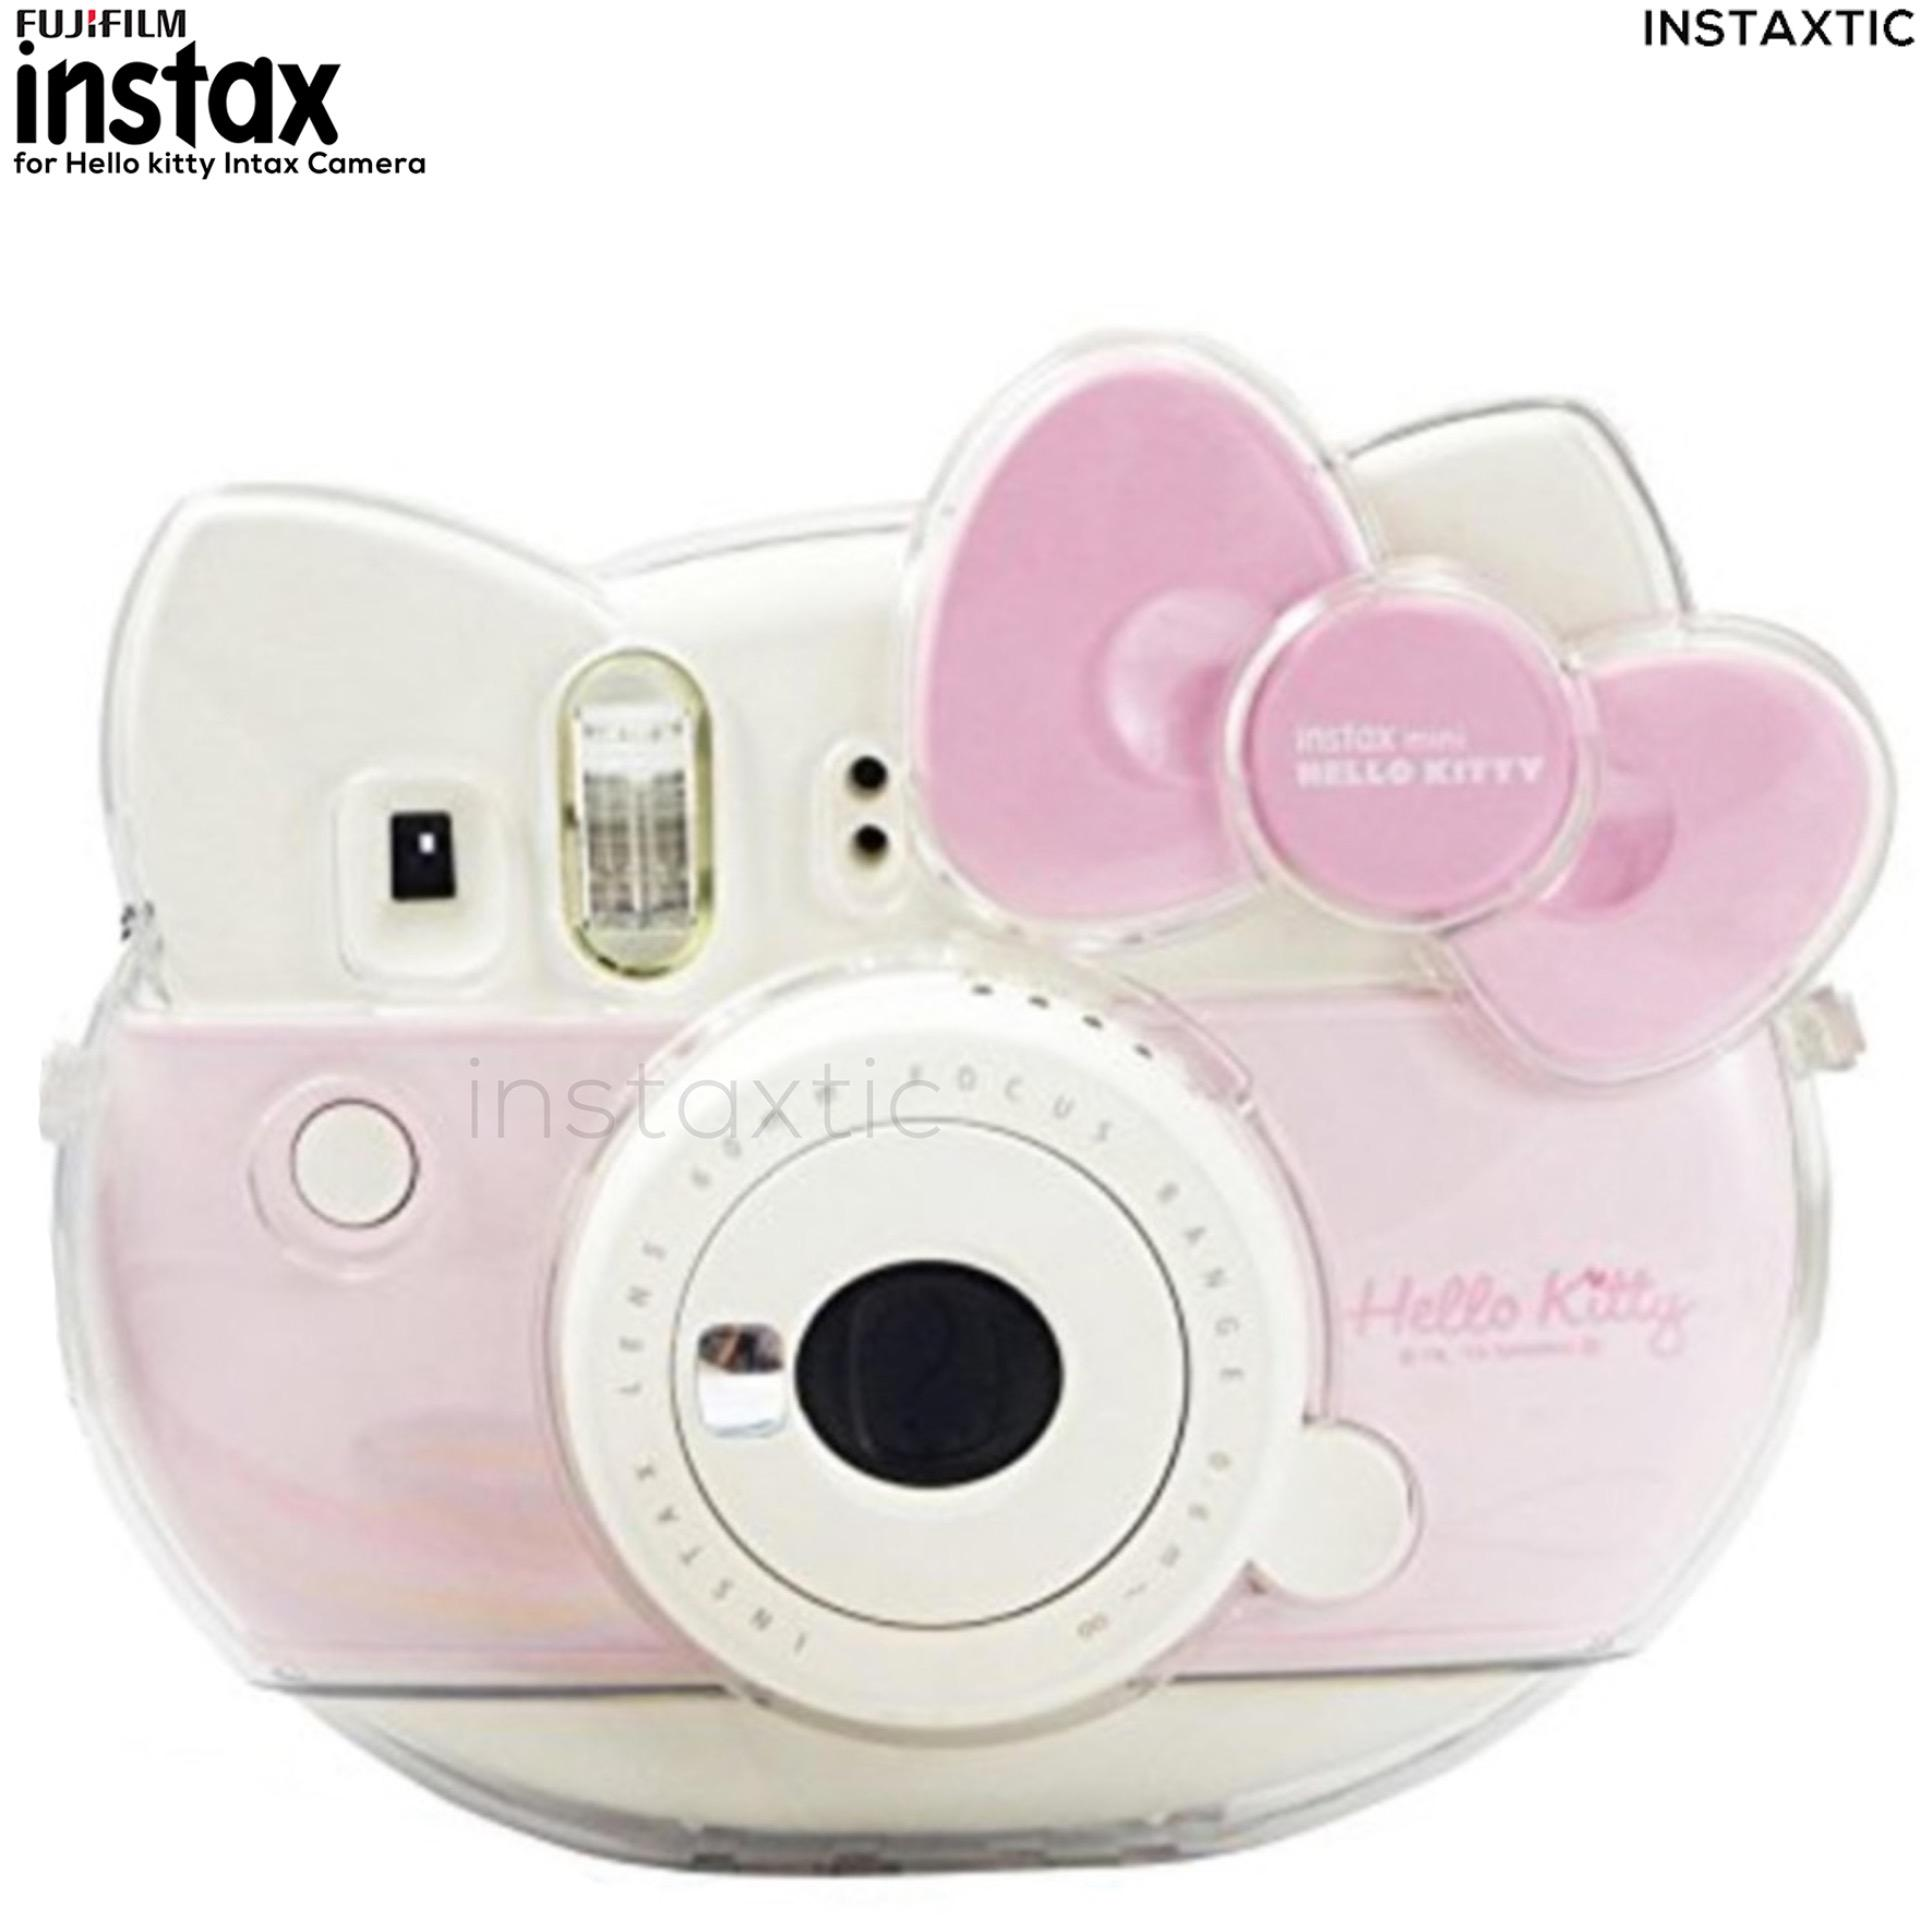 Instaxtic Transparent Clear Plastic Case For Fujifilm Instax Mini 8 Hello Kitty Face Camera HK